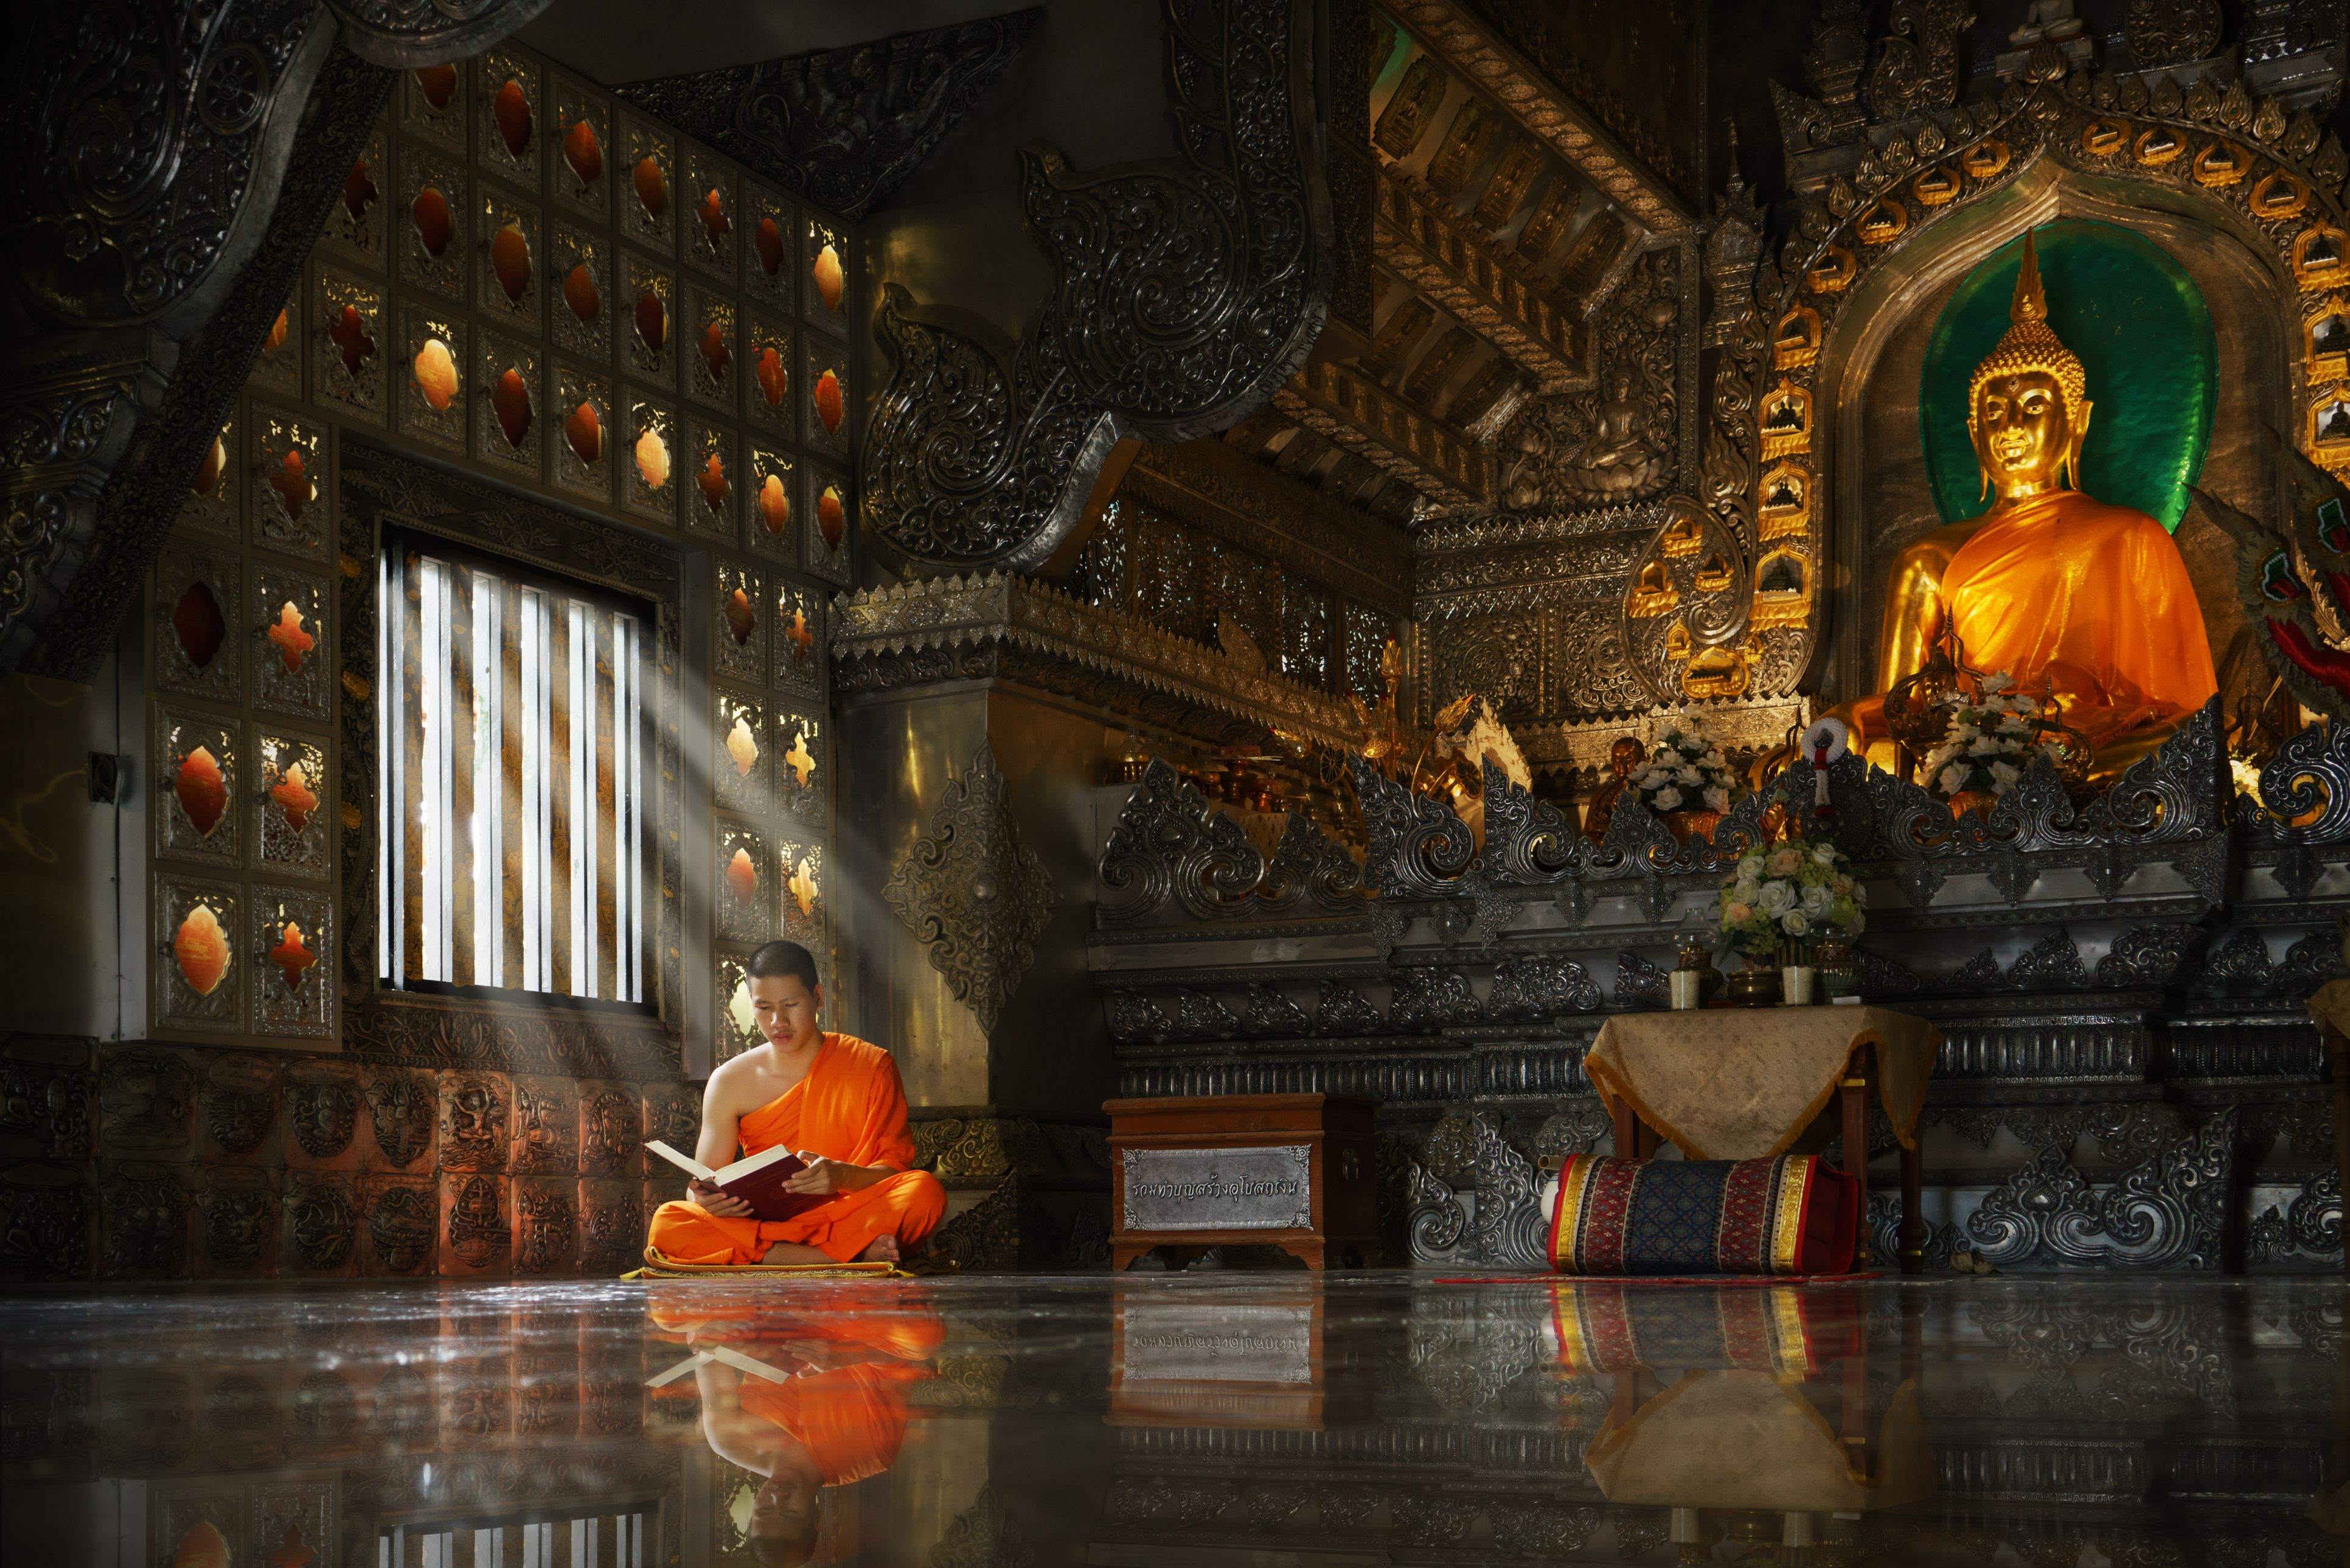 Eight Dharmapalas: Wrathful Protectors of Buddhism